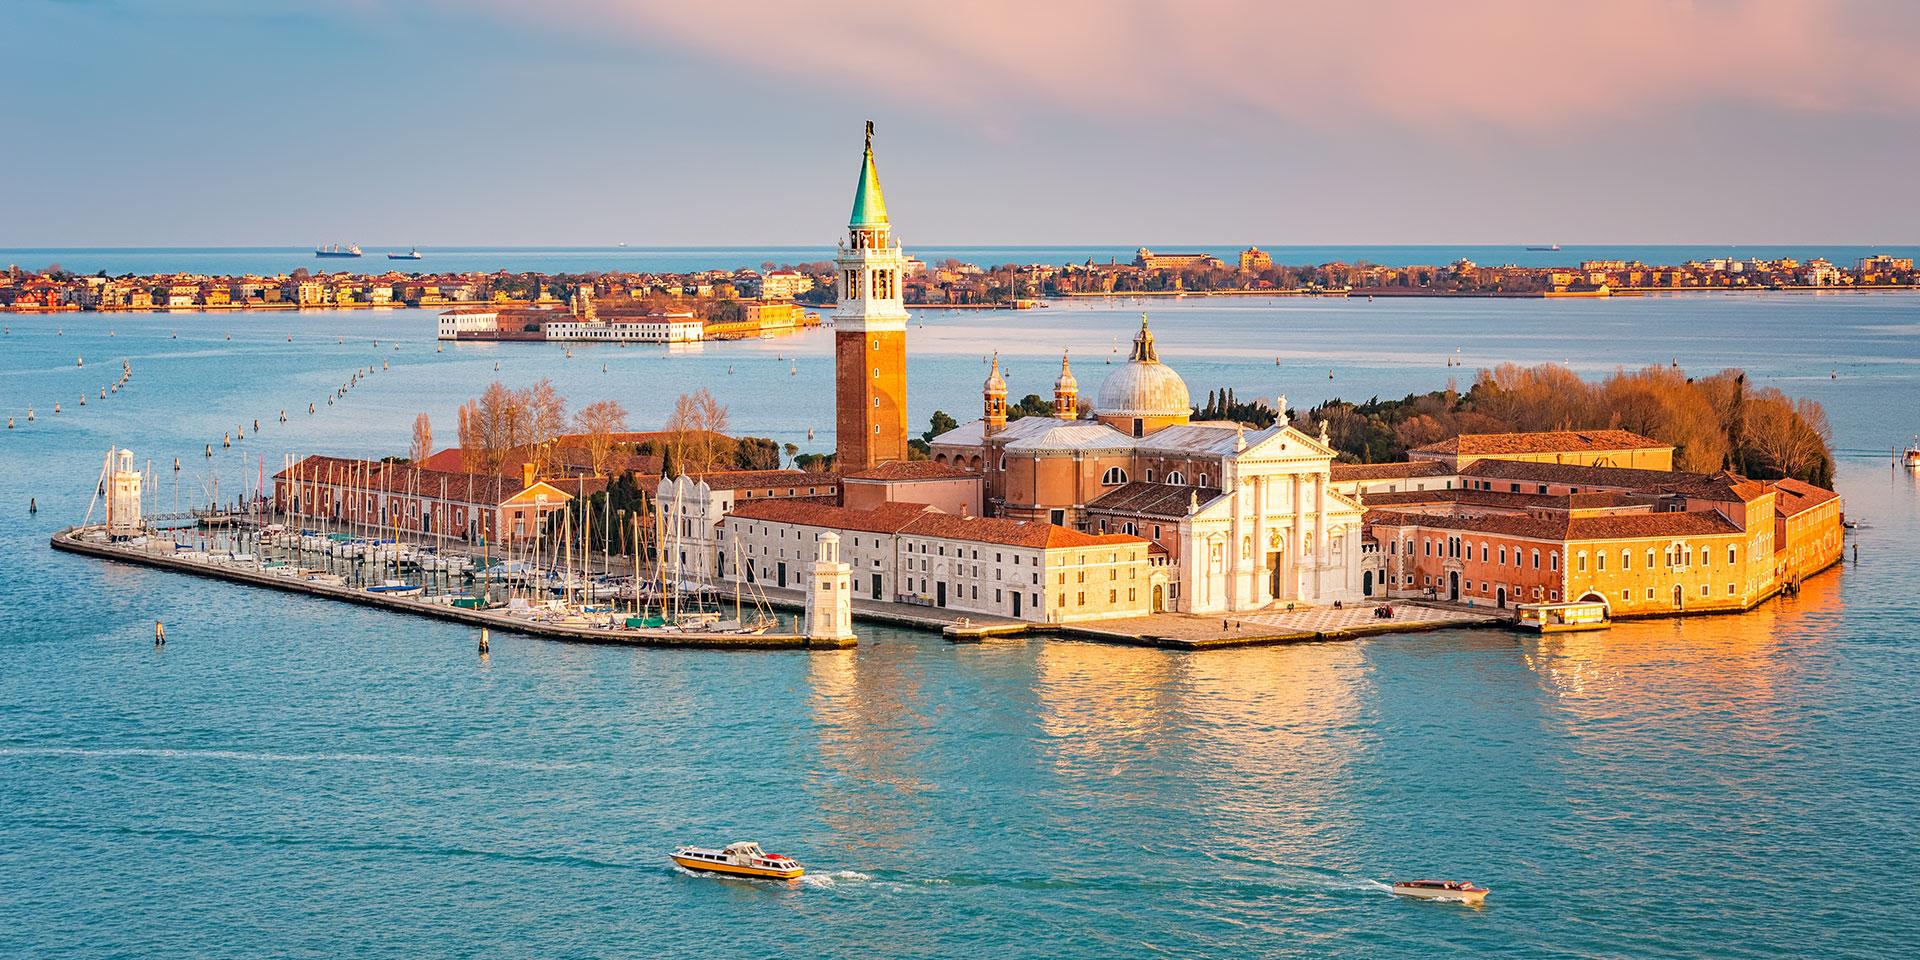 The Island of San Giorgio. Photo: Getty Images